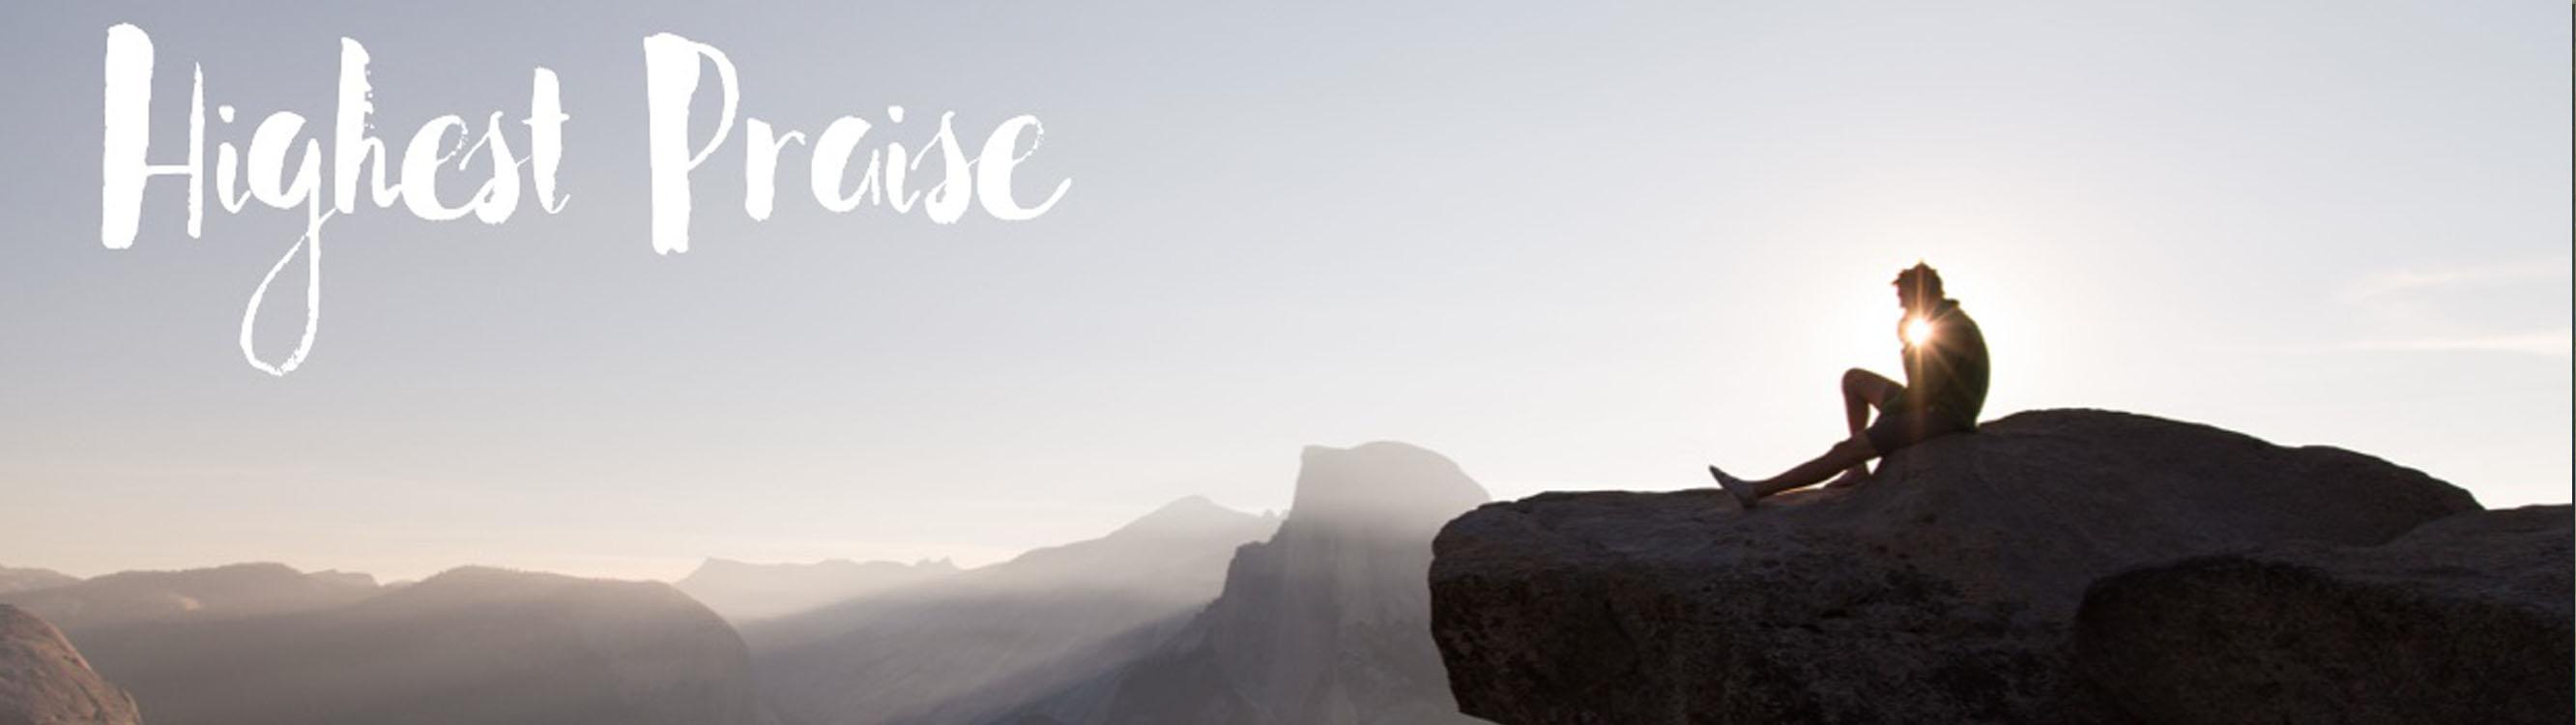 highest_praise_big_banner